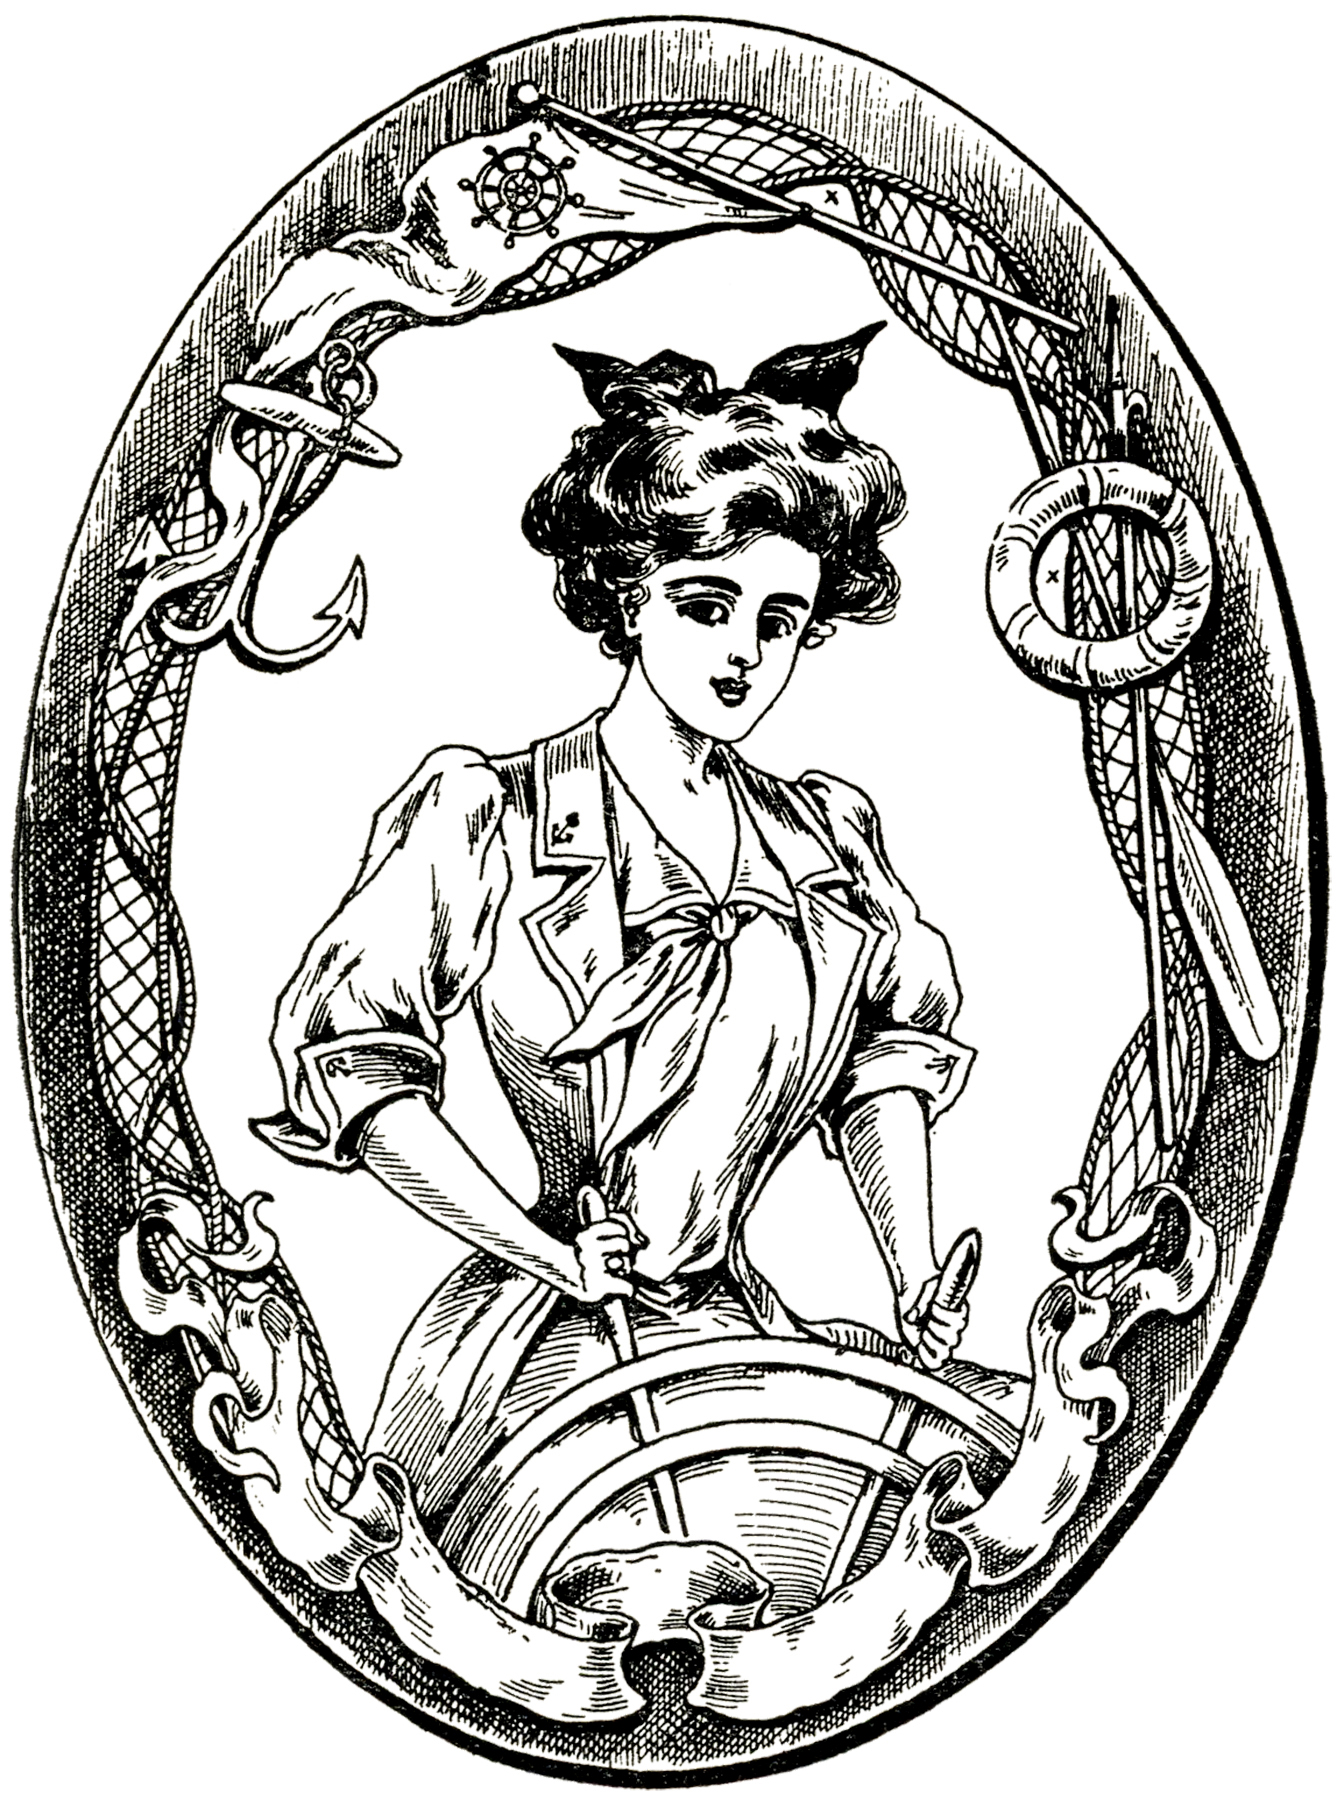 Vintage Sailor Lady Image